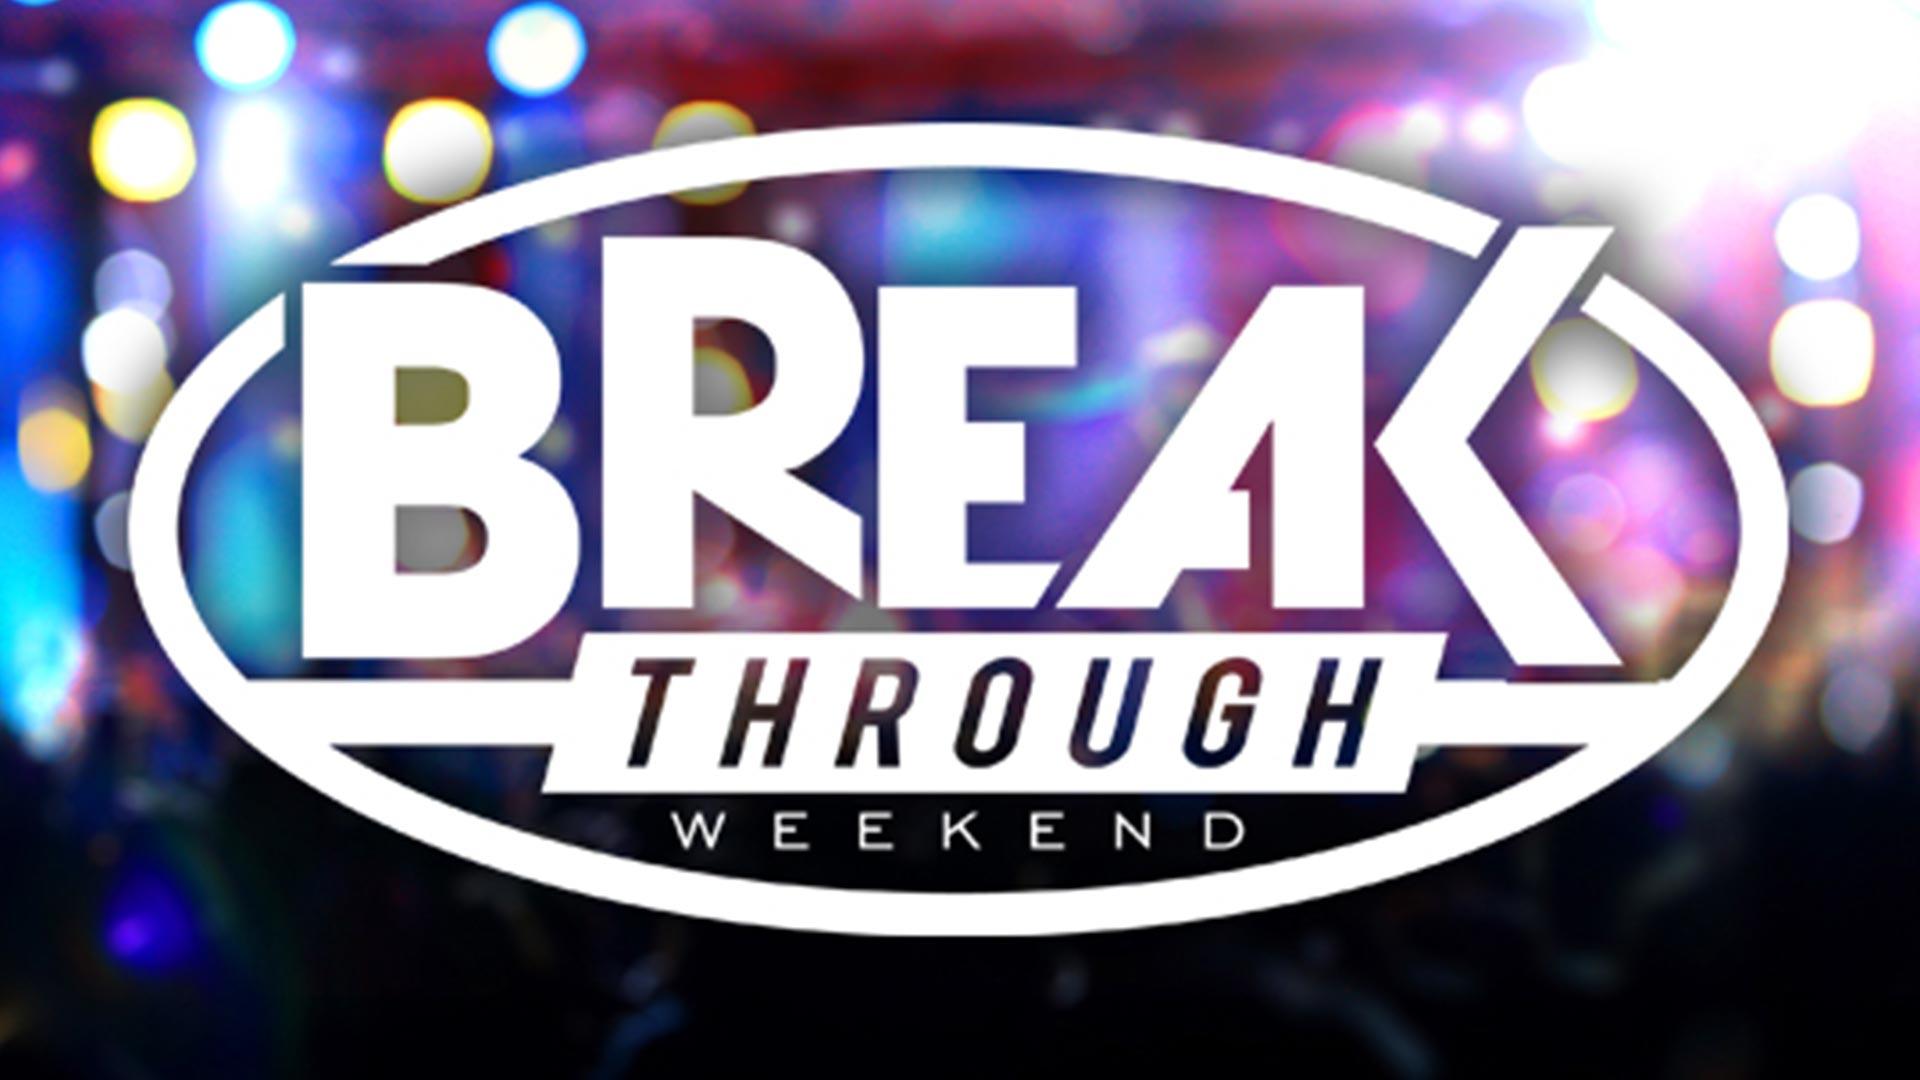 Breakthrough weekend 2018 1920x1080